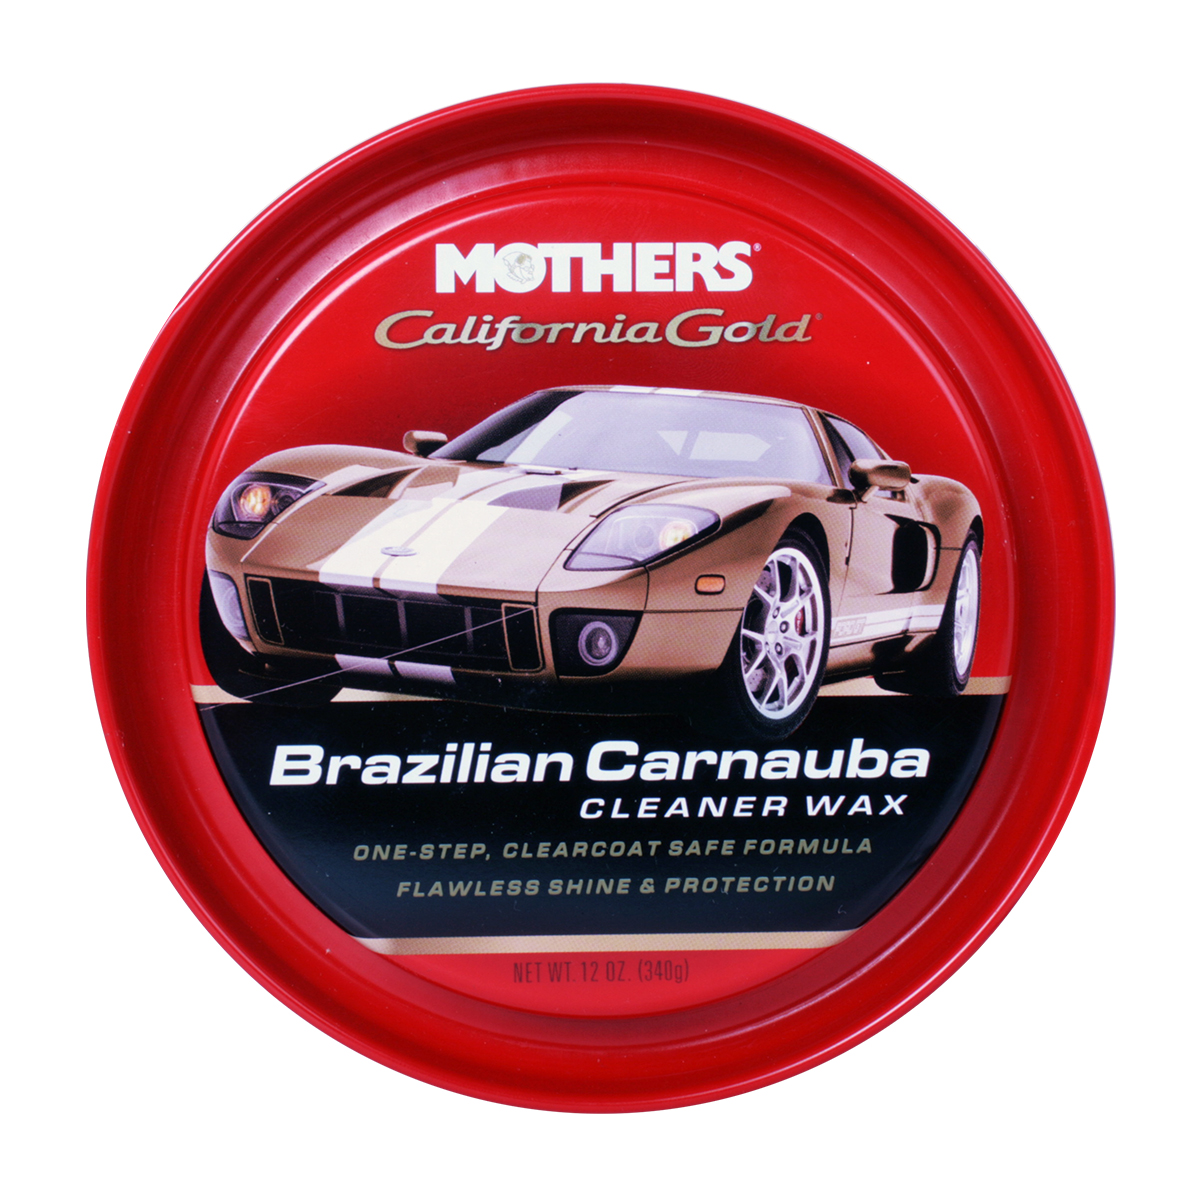 98275 Mothers California Gold Brazilian Carnauba Cleaner Wax